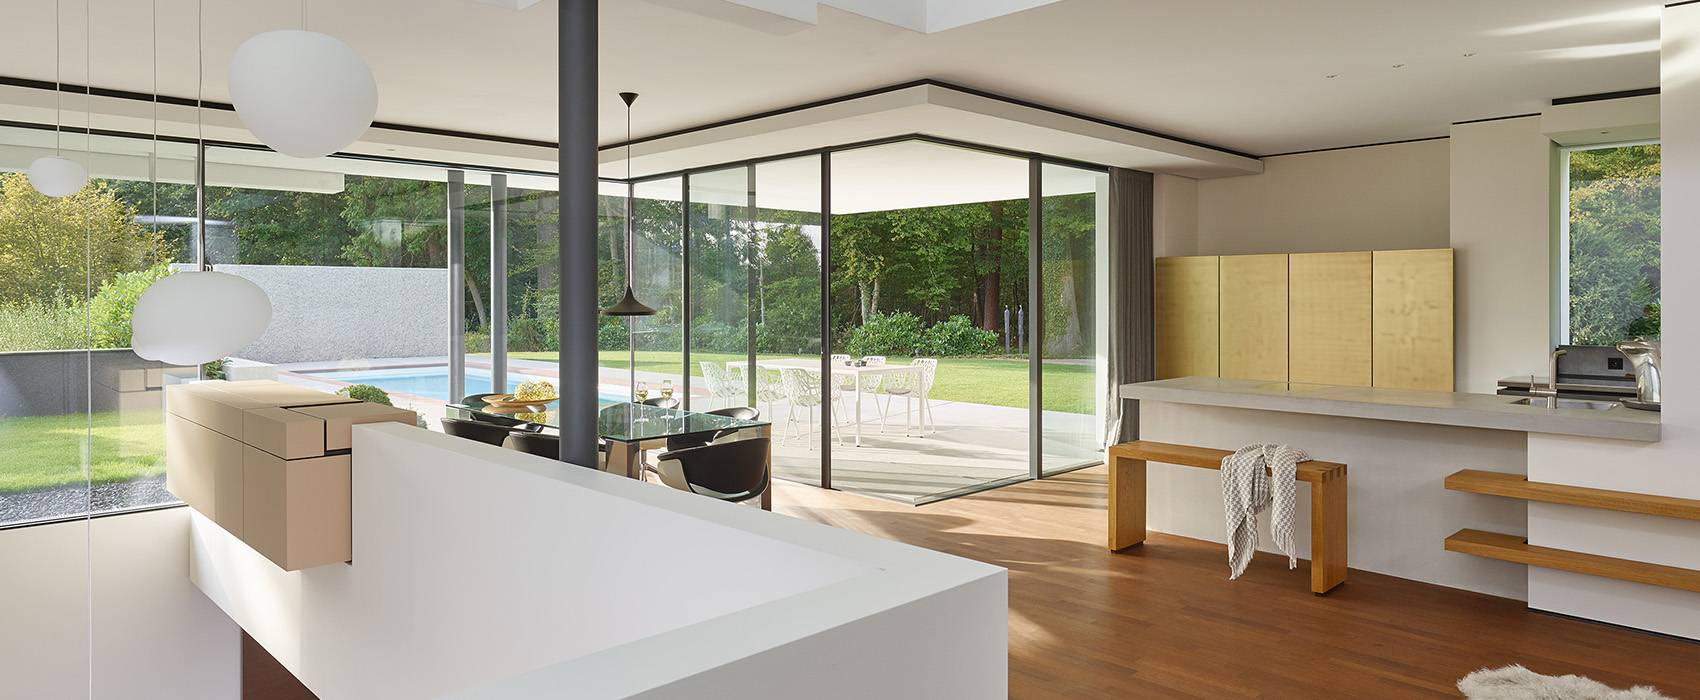 hummel systemhaus l sungen. Black Bedroom Furniture Sets. Home Design Ideas